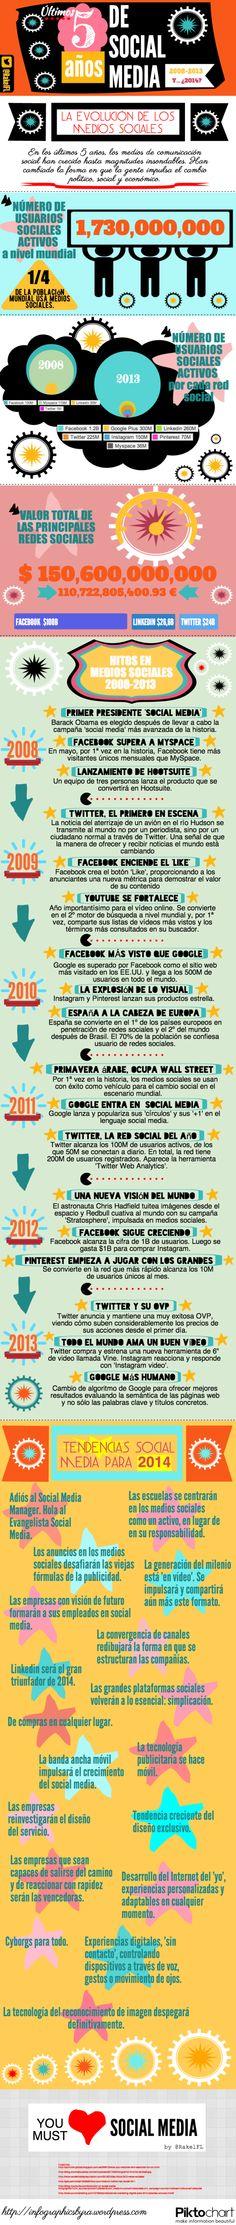 Redes Sociales 2008-2014 #infografia #infographic #socialmedia #SWBSocial